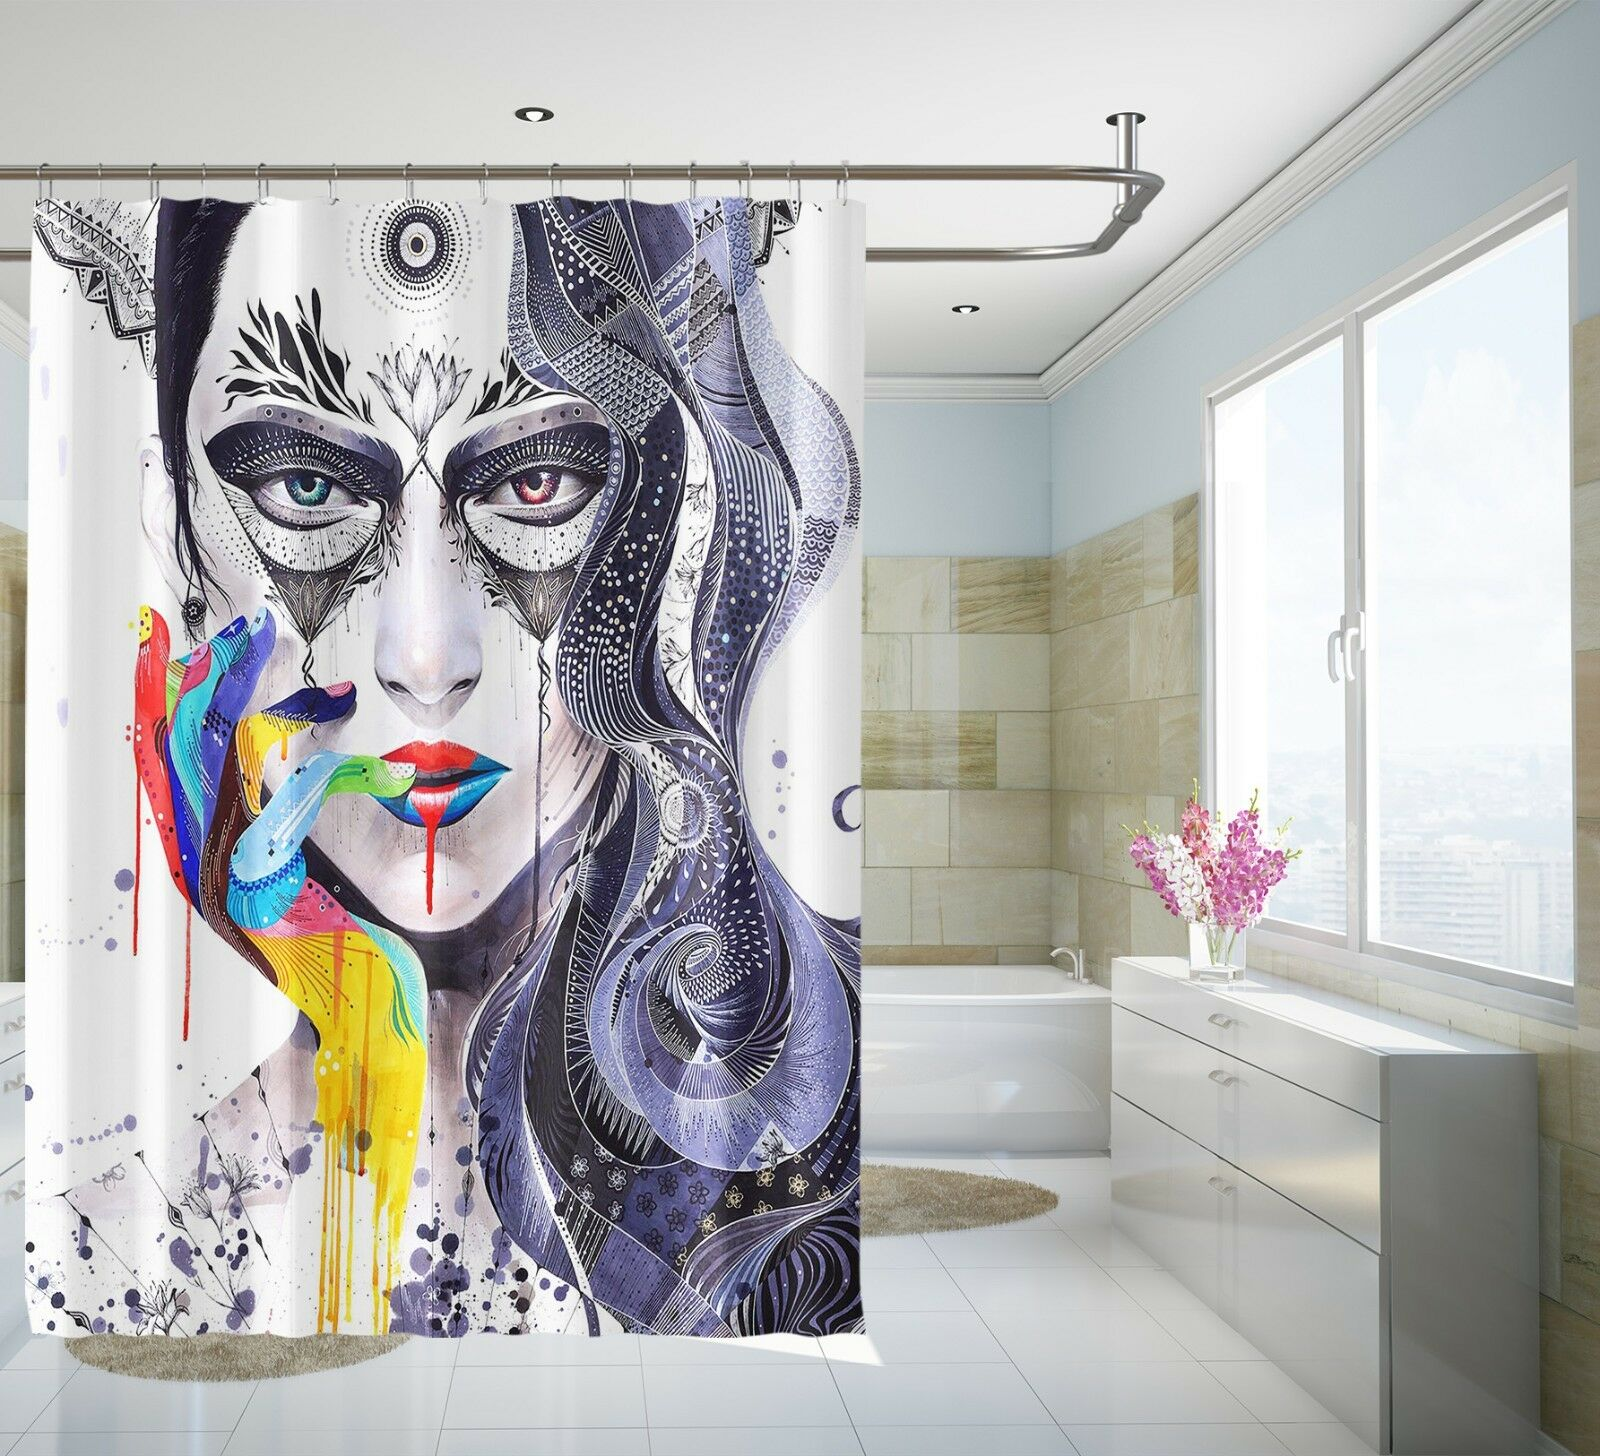 3D Farbe Mädchen 3 Duschvorhang Wasserdicht Faser Bad Daheim Windows Toilette DE